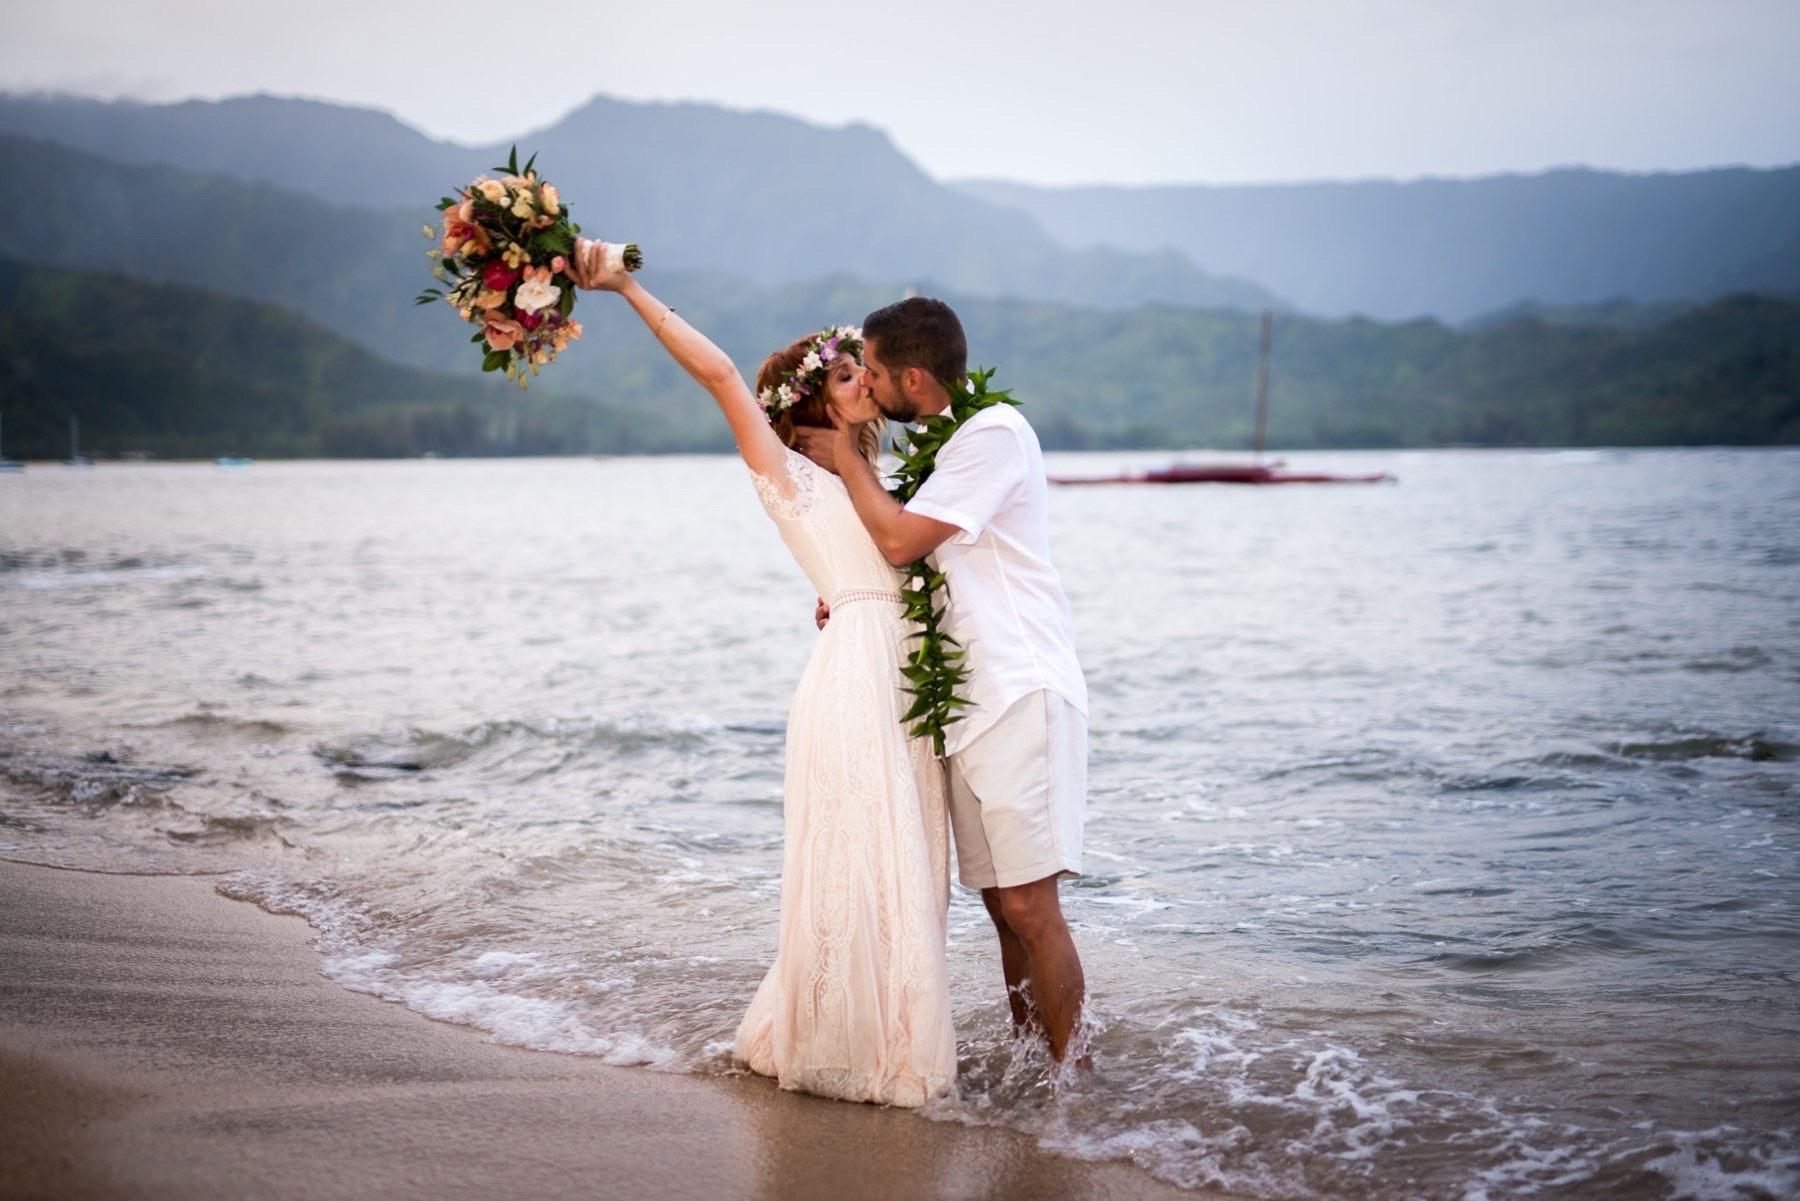 Nina & Allen getting married in Hawaii.